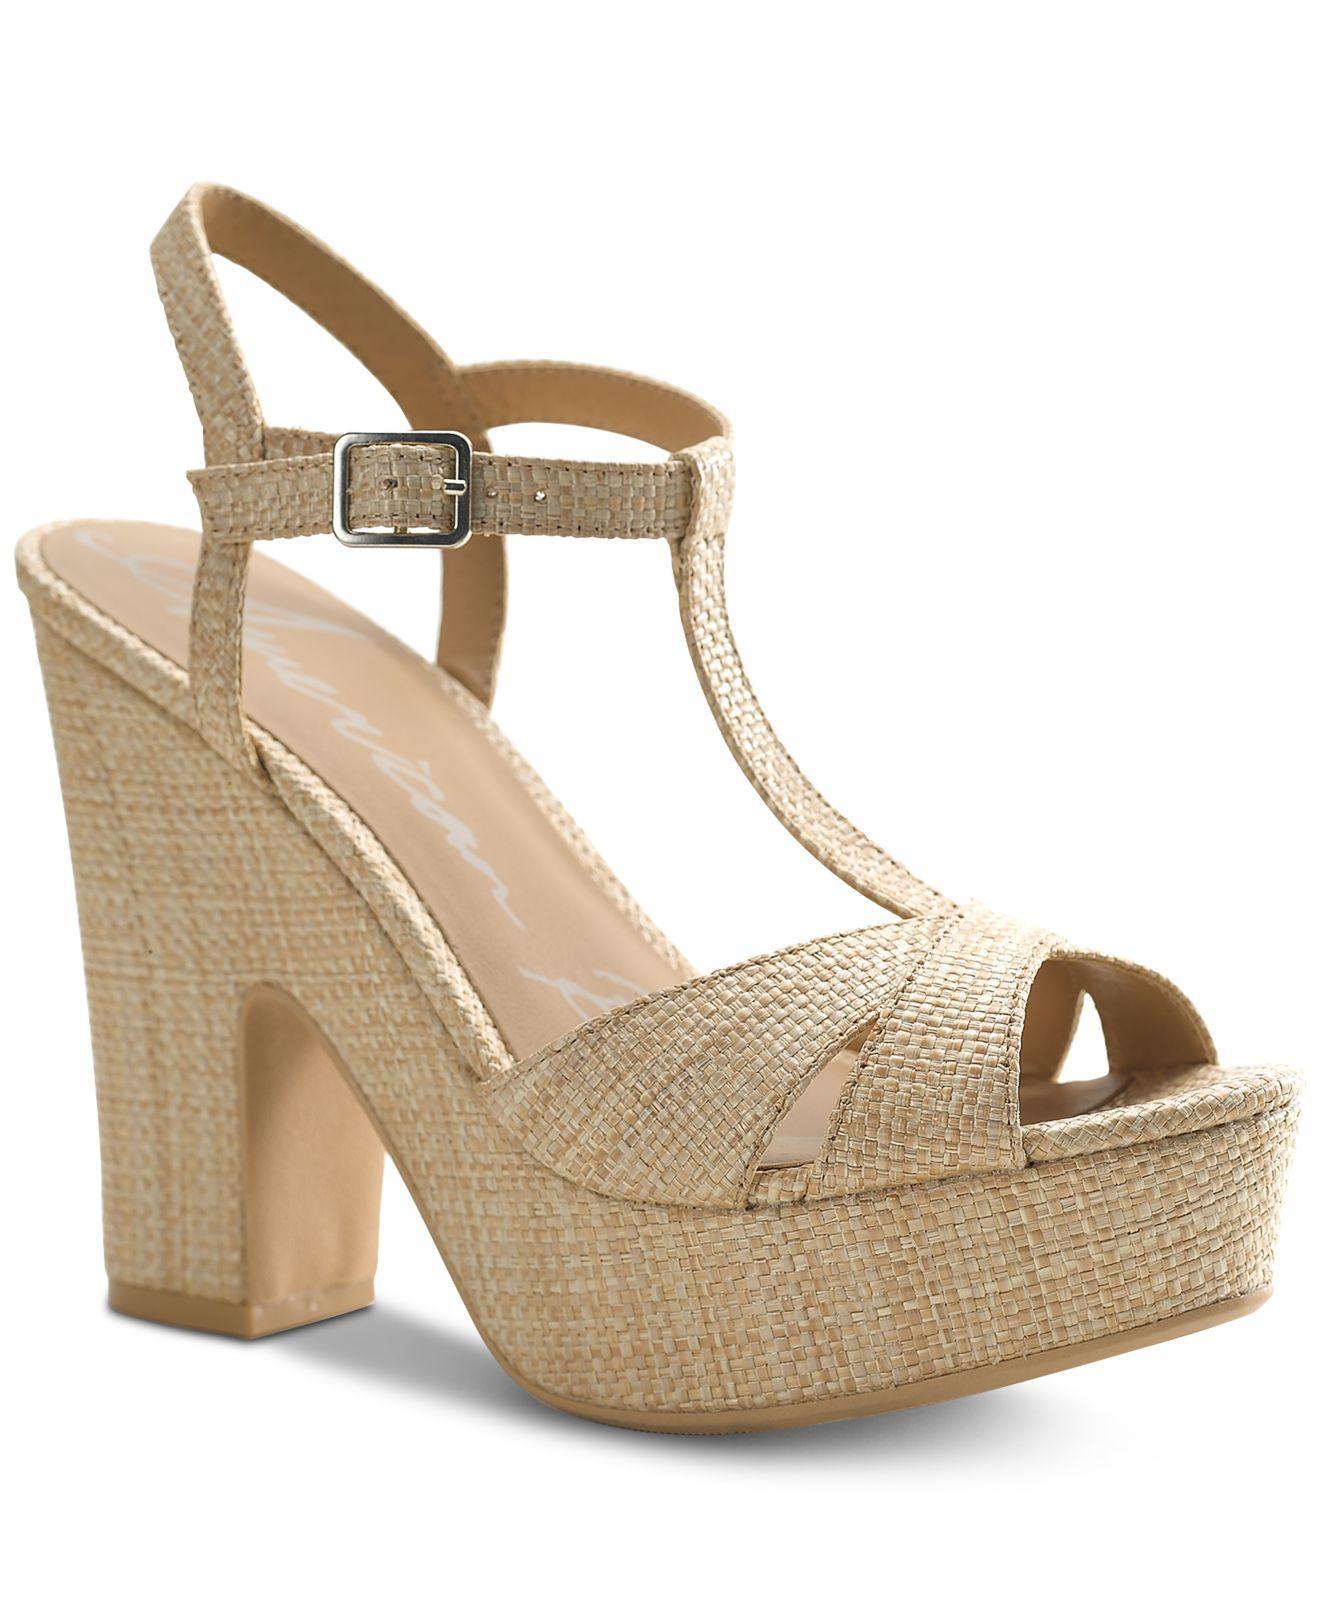 36a498fb030 American Rag. Women s Natural Jamie T-strap Platform Dress Sandals